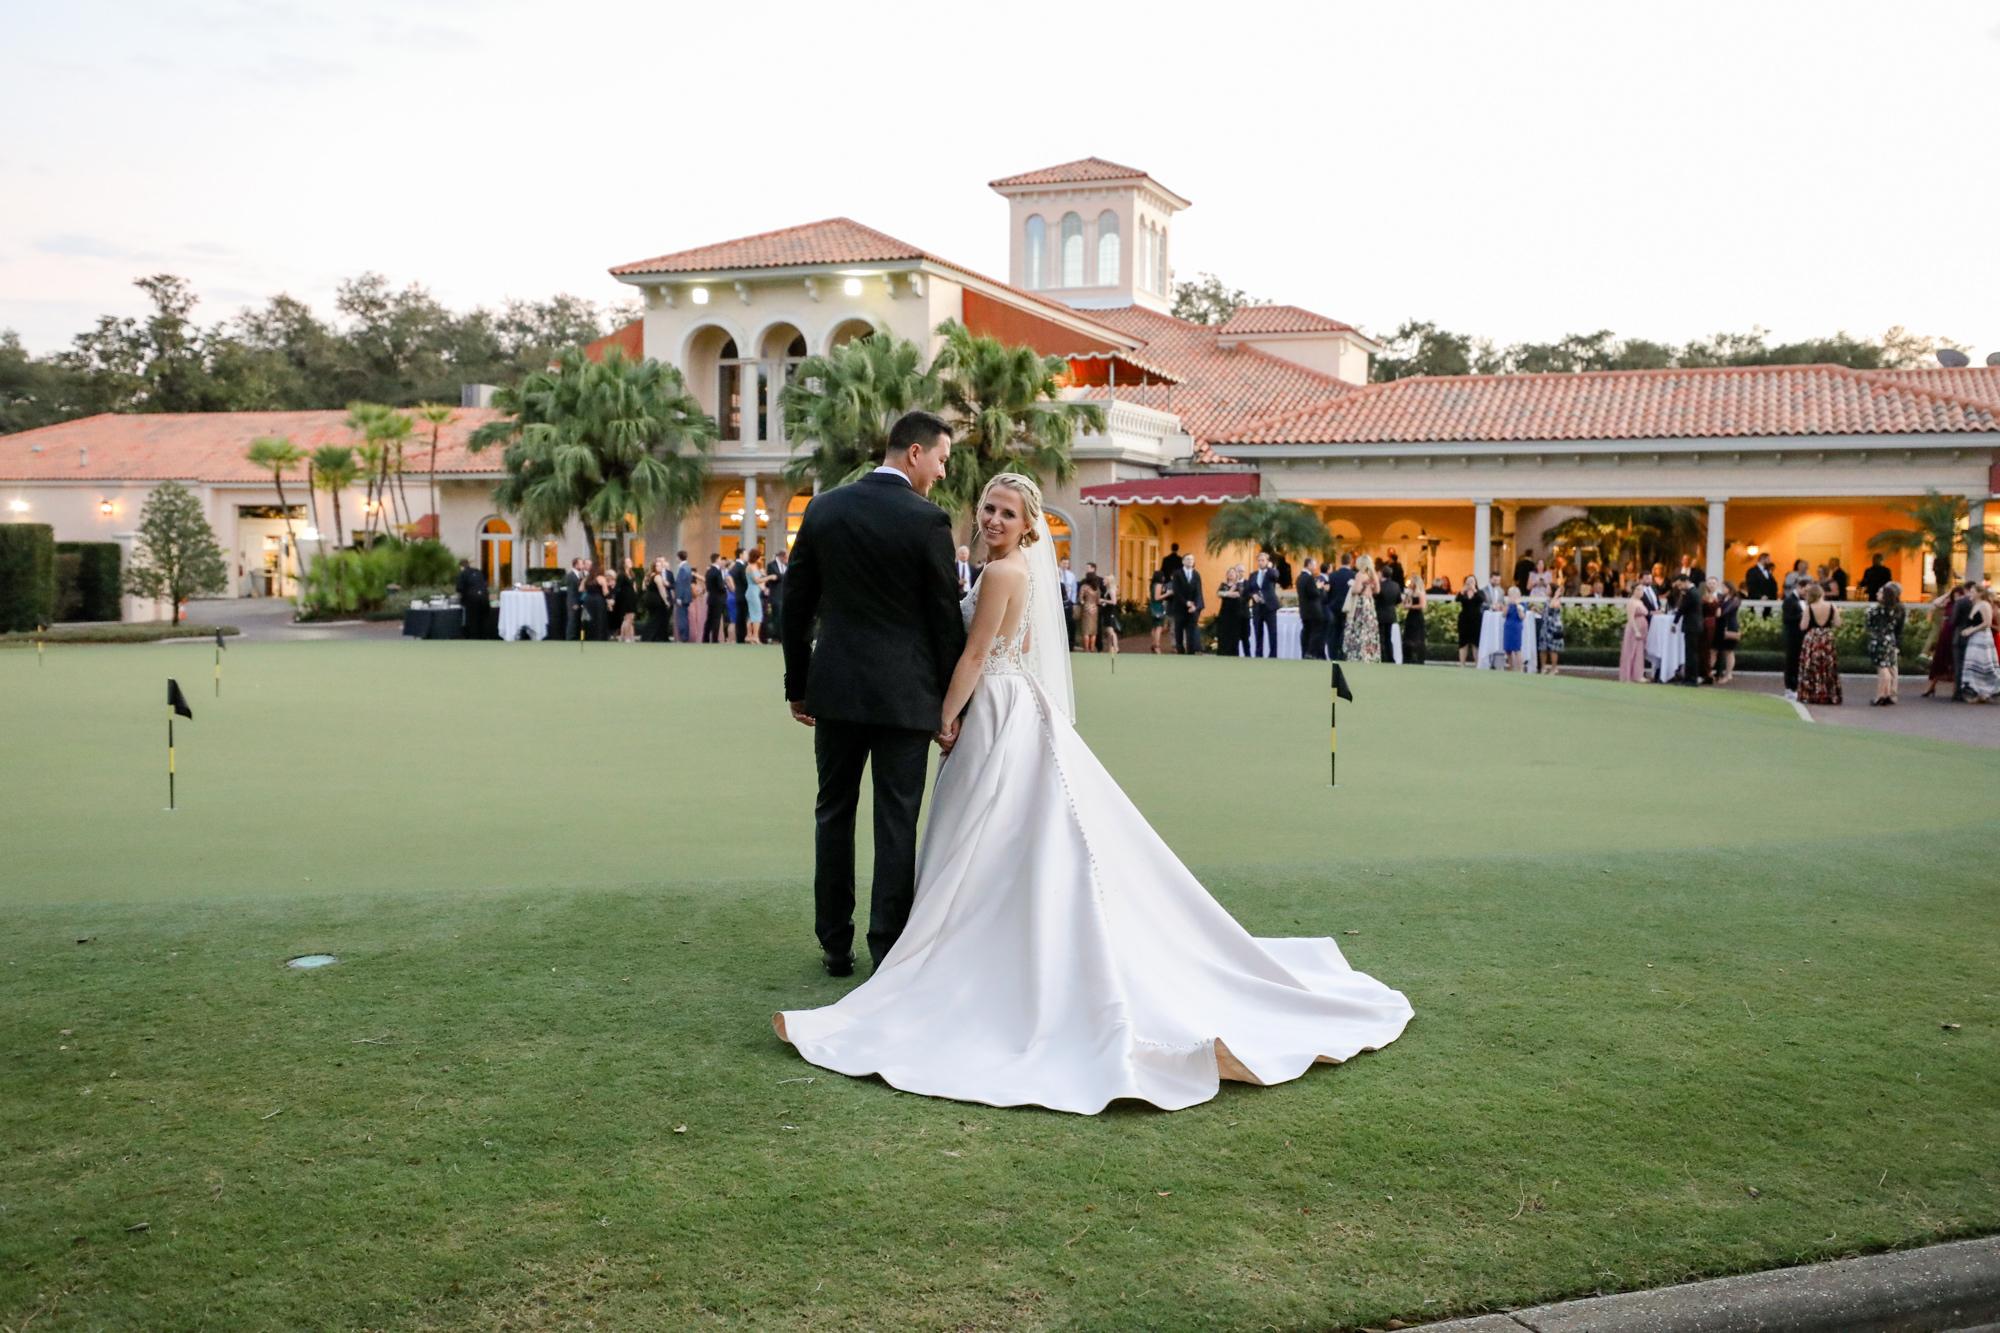 Bride and Groom Outdoor Golf Course Putting Green Wedding Photo | | Photographer Lifelong Photography Studio | Tampa Wedding Venue Avila Golf & Country Club |